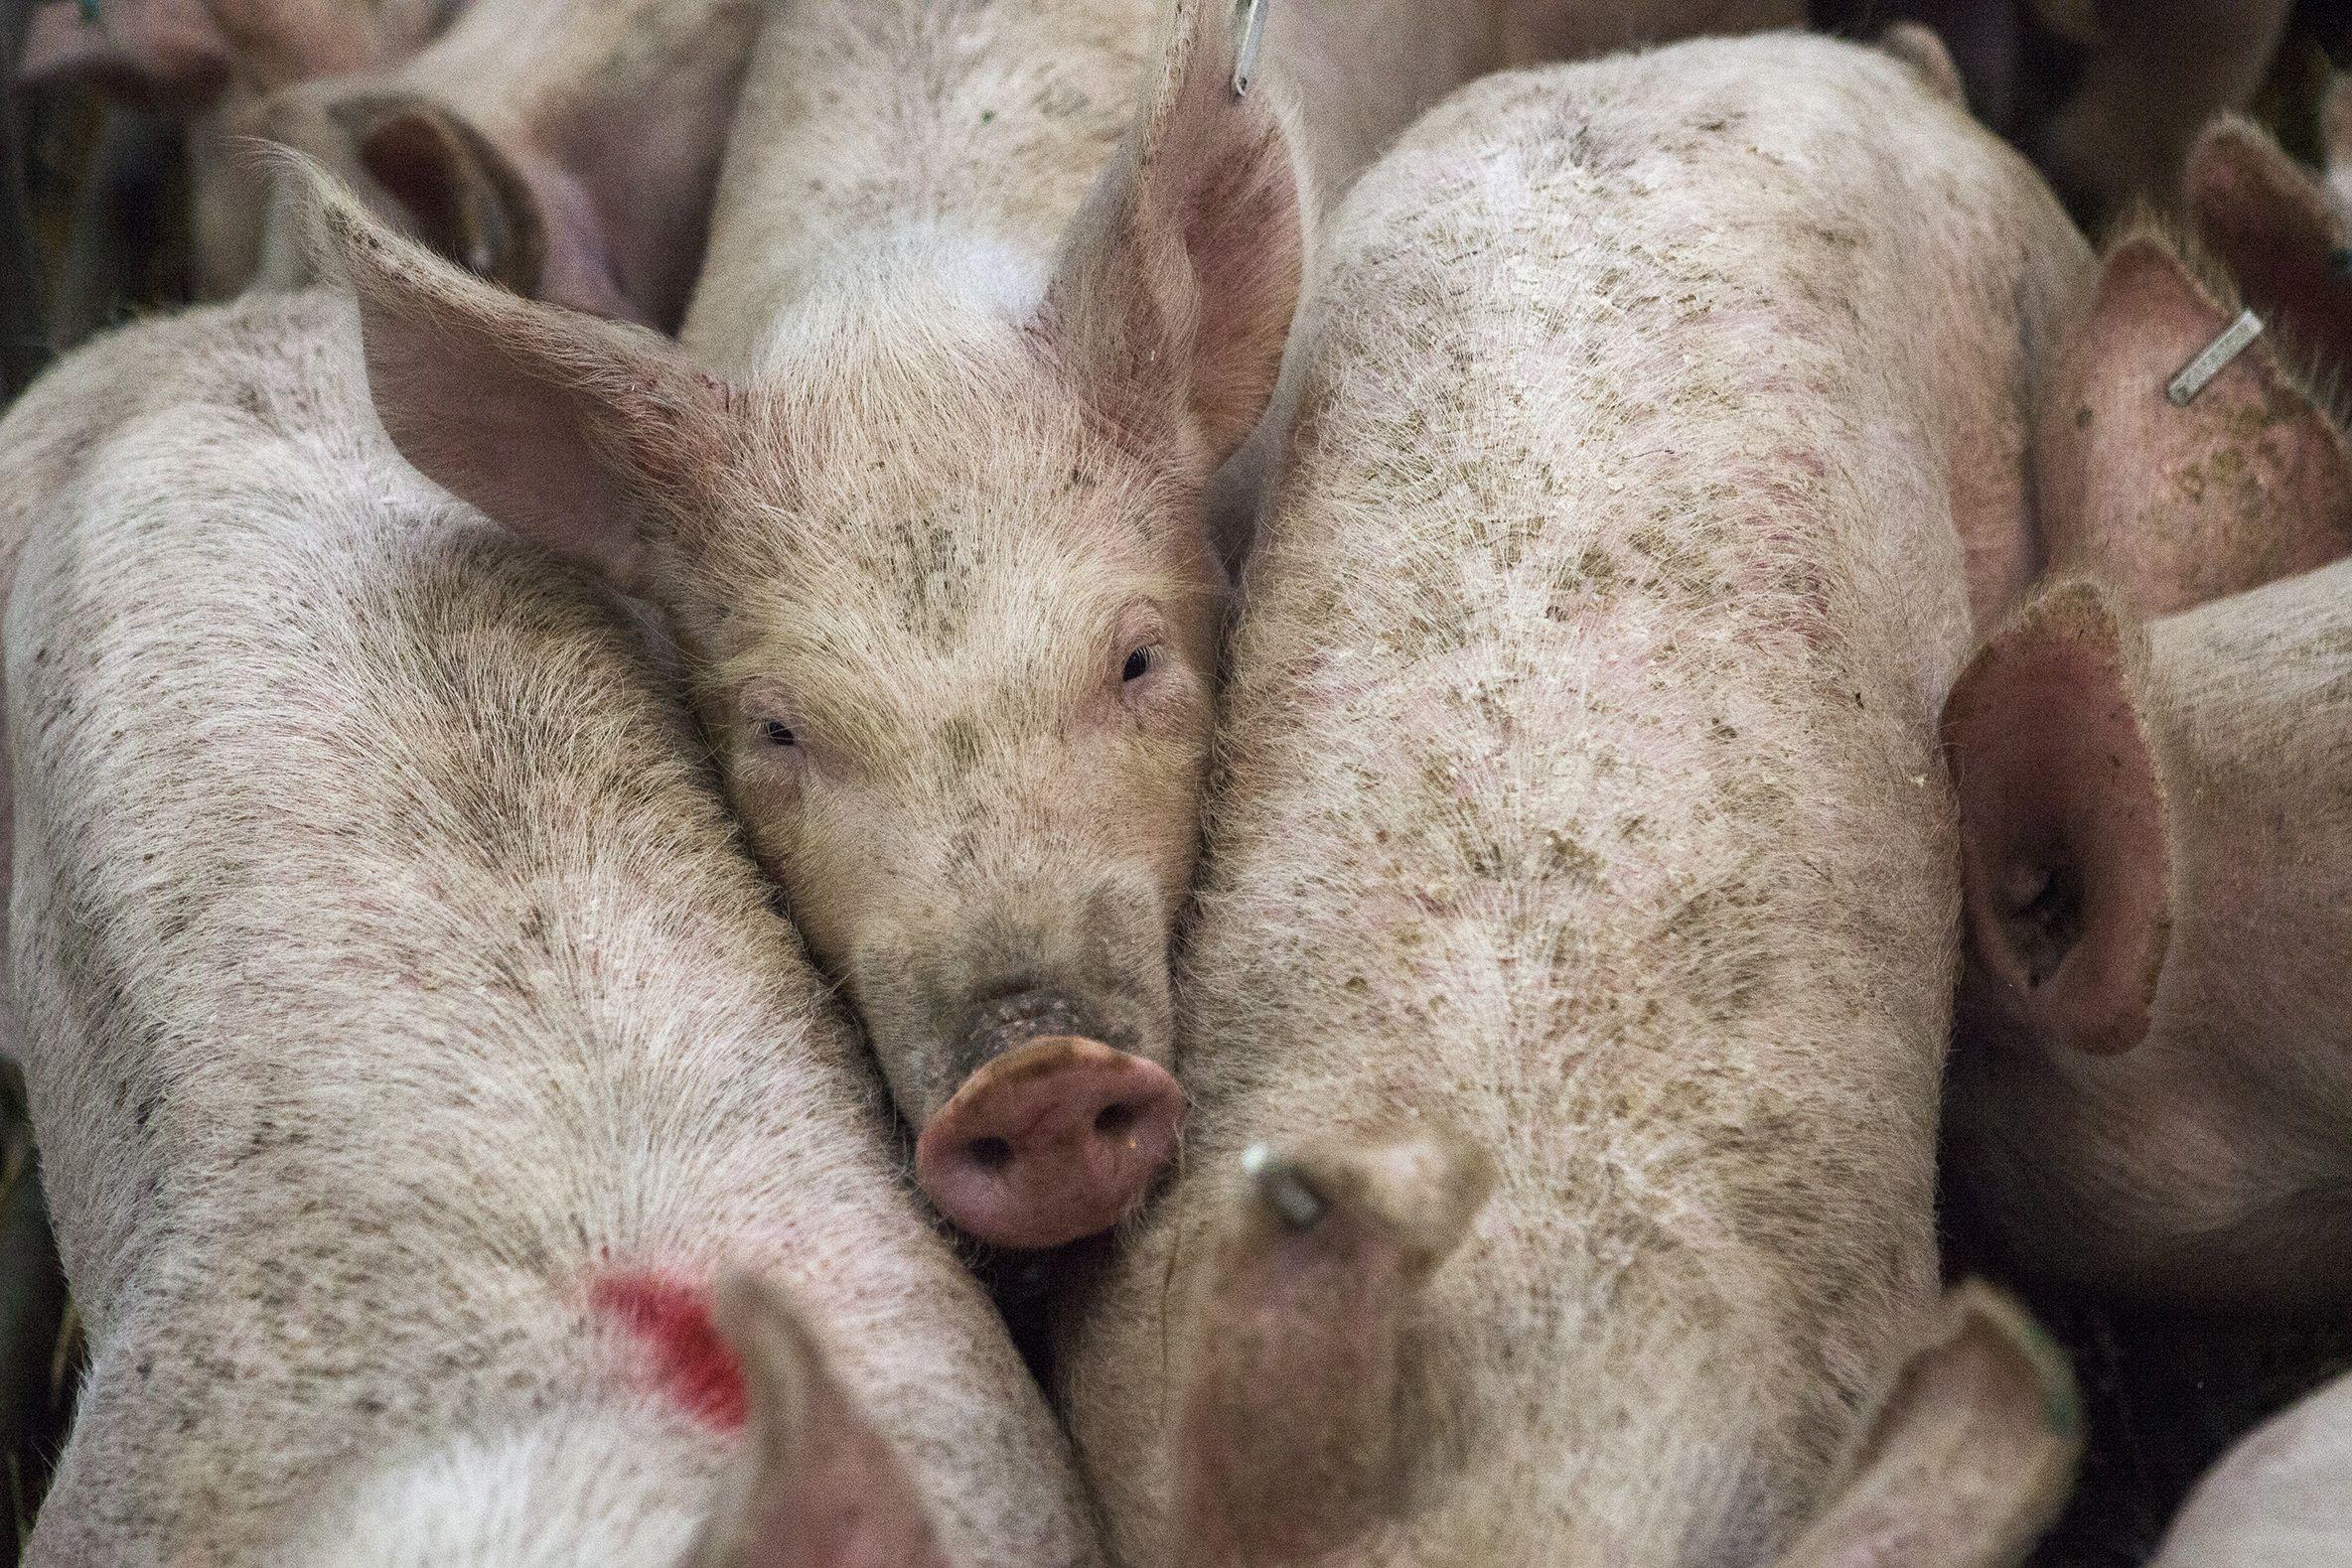 Factory farming - pigs.